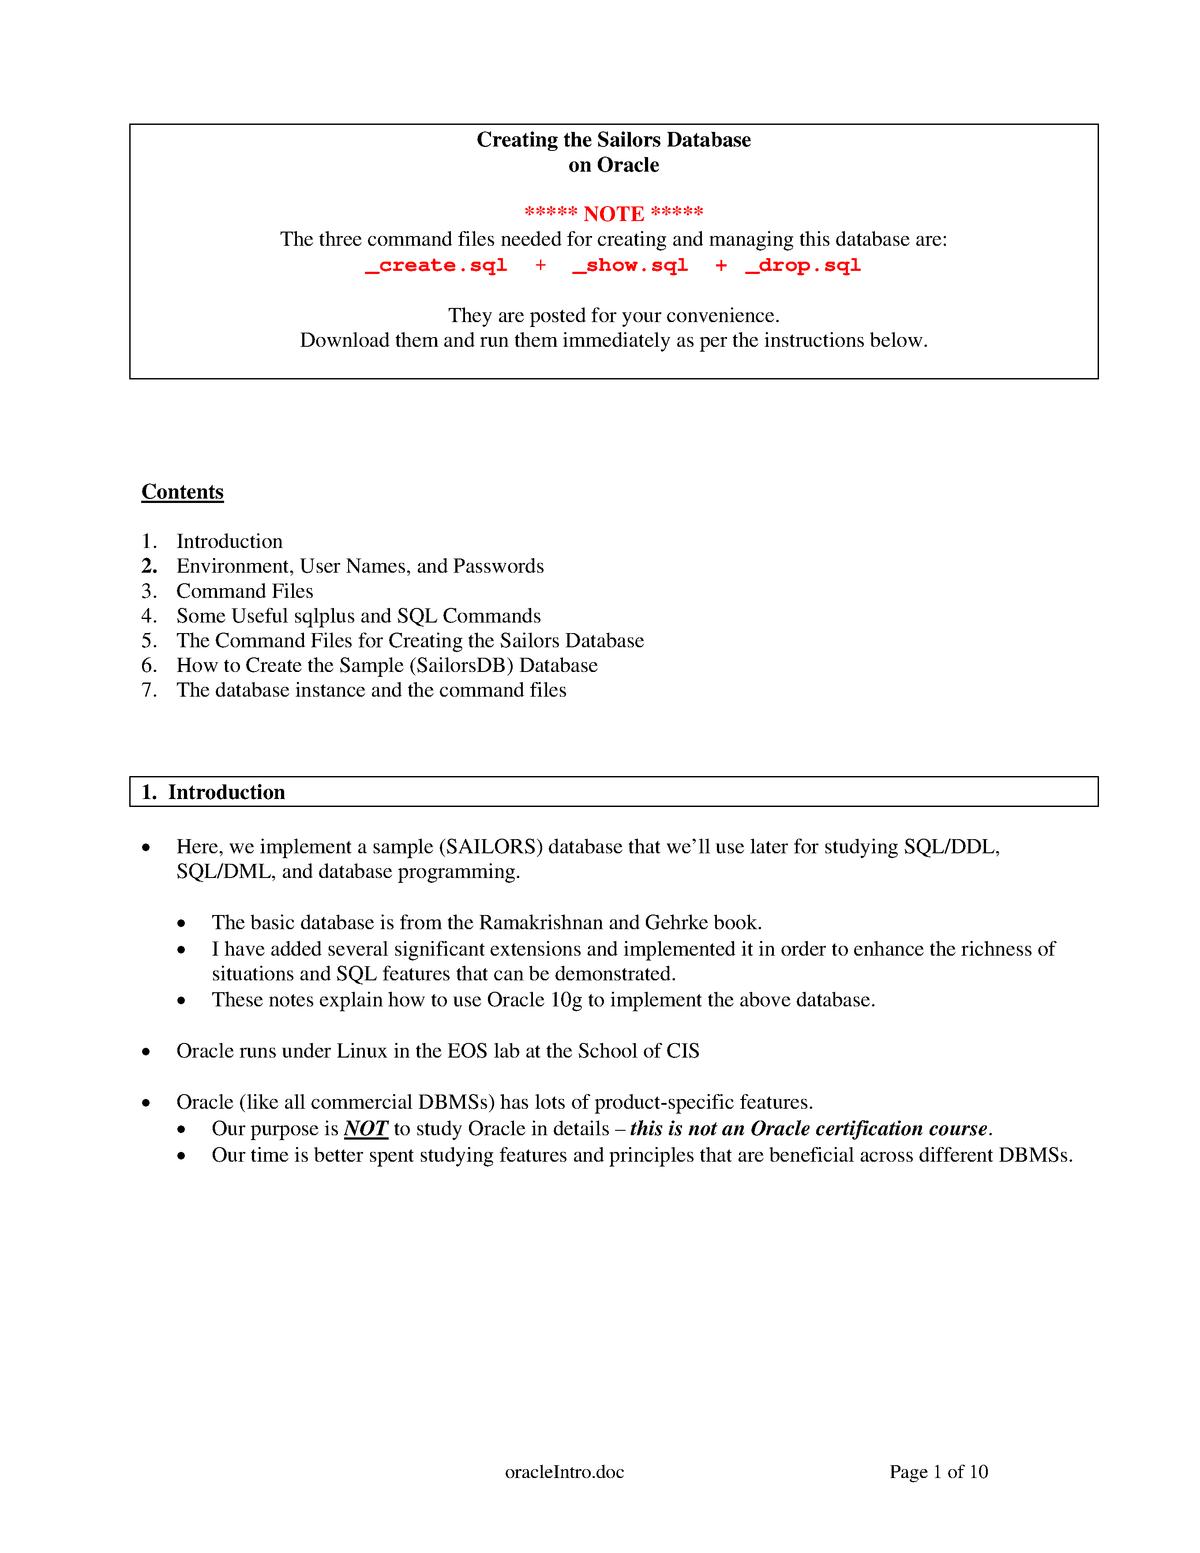 Oracle Intro - CIS 353: Database - StuDocu